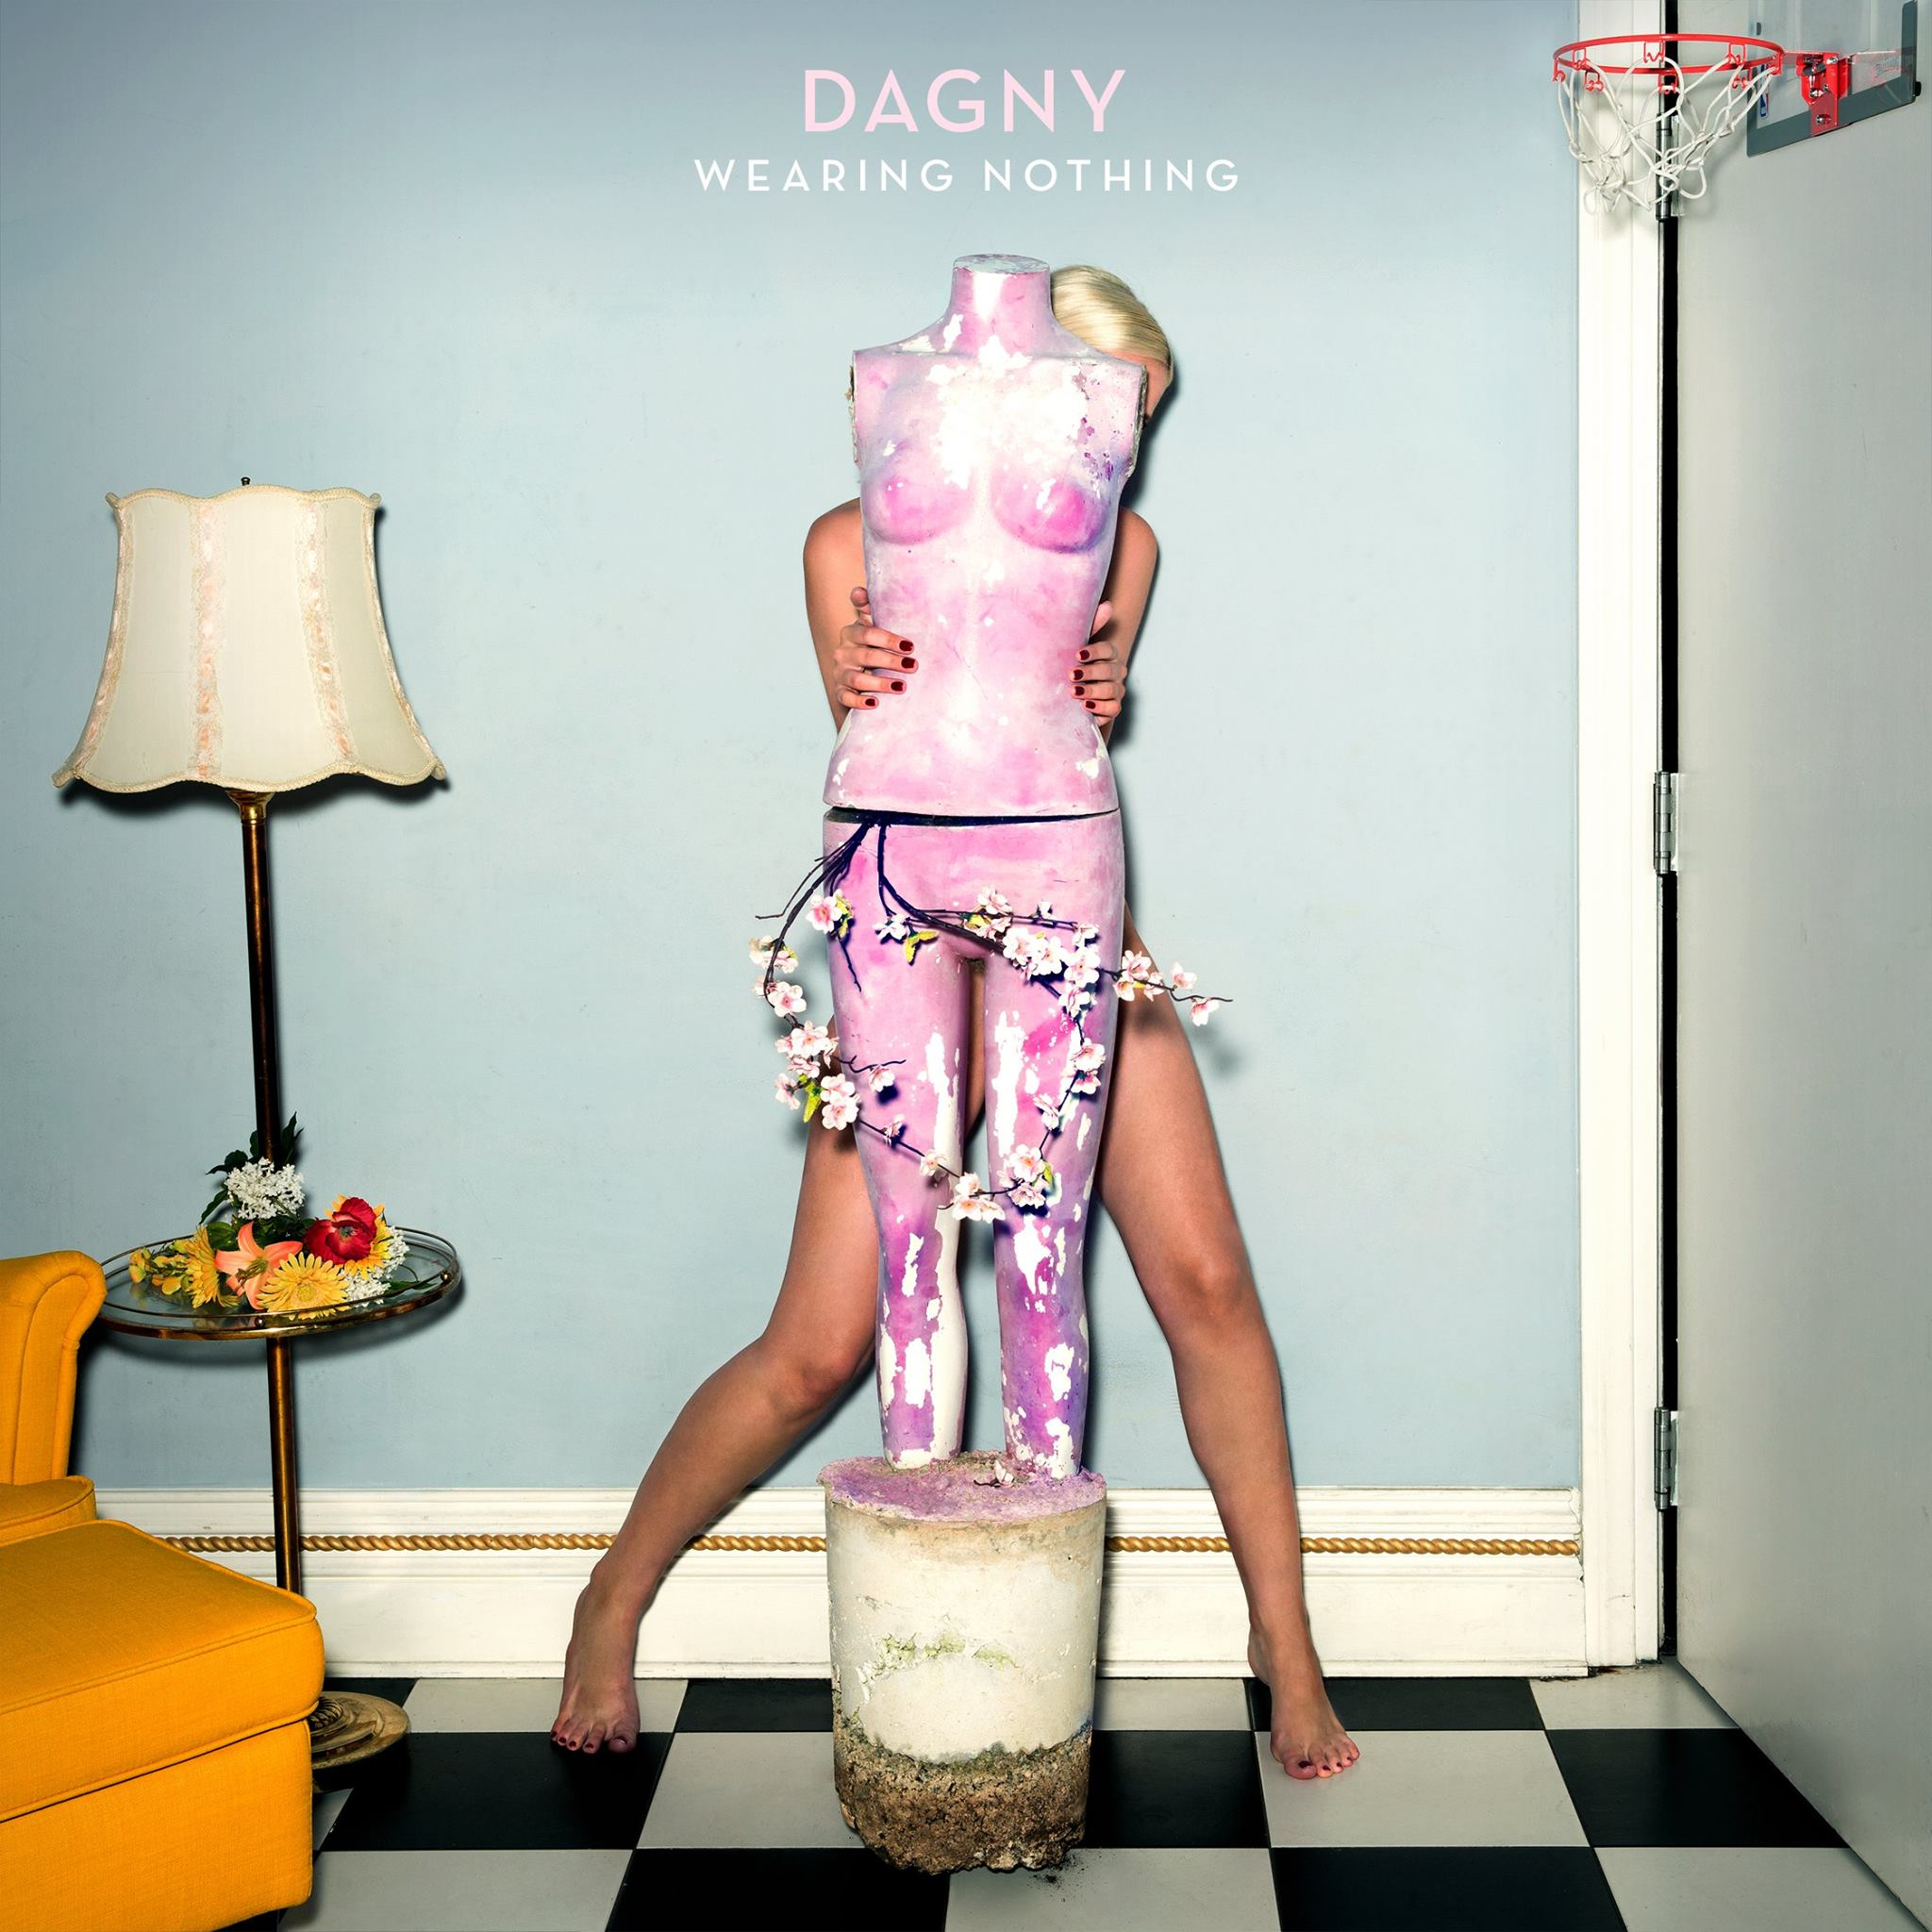 Dagny JustMusic.fr